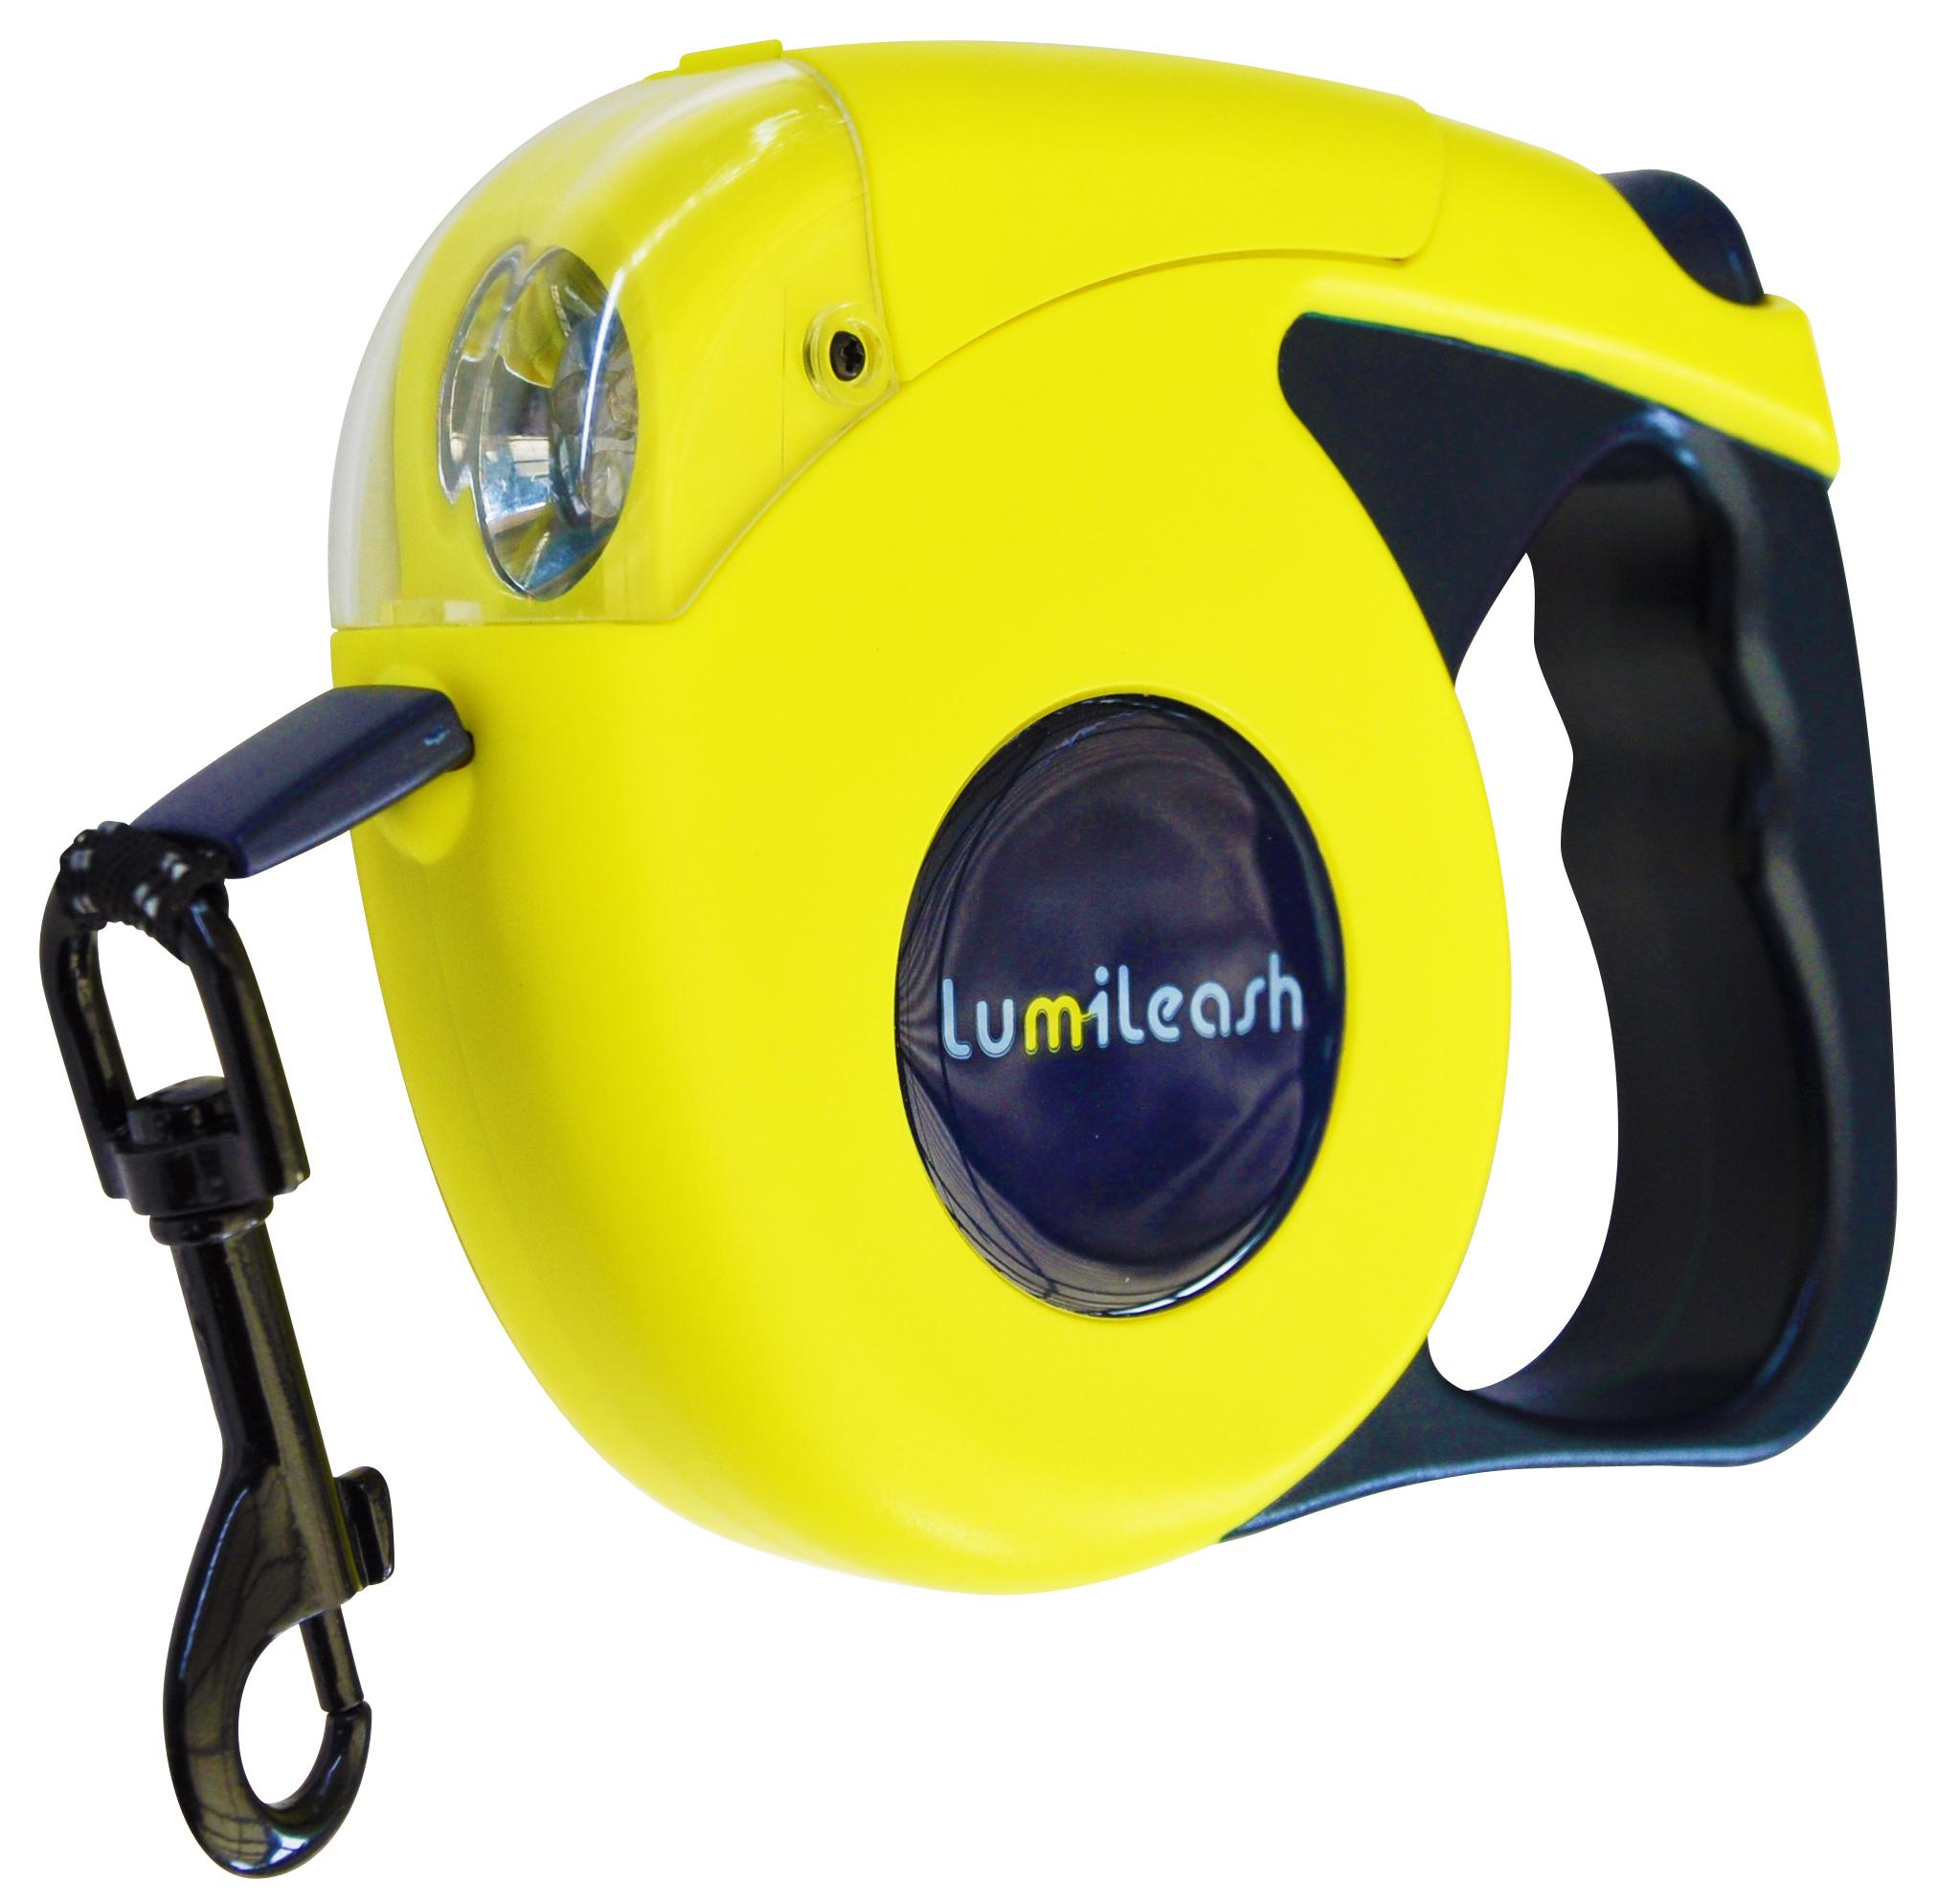 Skeelo Releases Lumileash Retractable Leash With